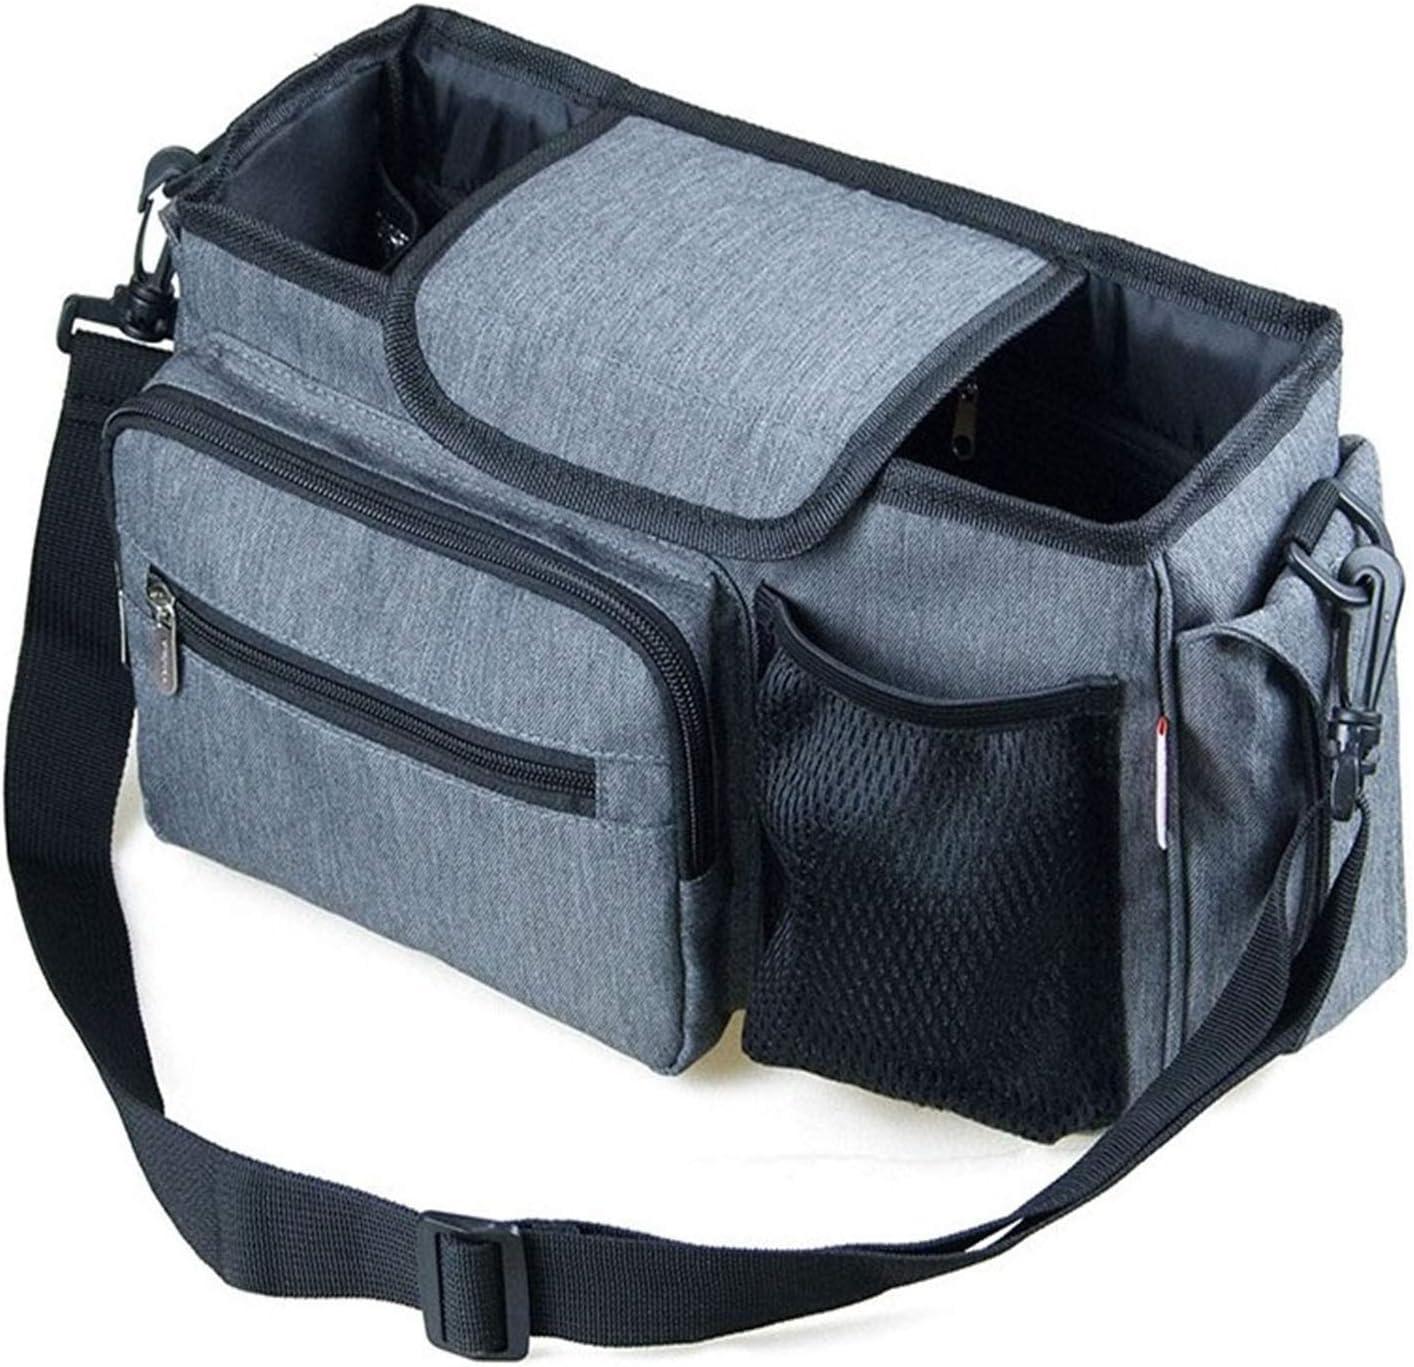 Efaithtek Baby Stroller Storage Bag Travel Handbag, Waterproof with Cup Holder, Multi-Purpose, Suitable for Baby Products Storage, Travel Storage (Gray)